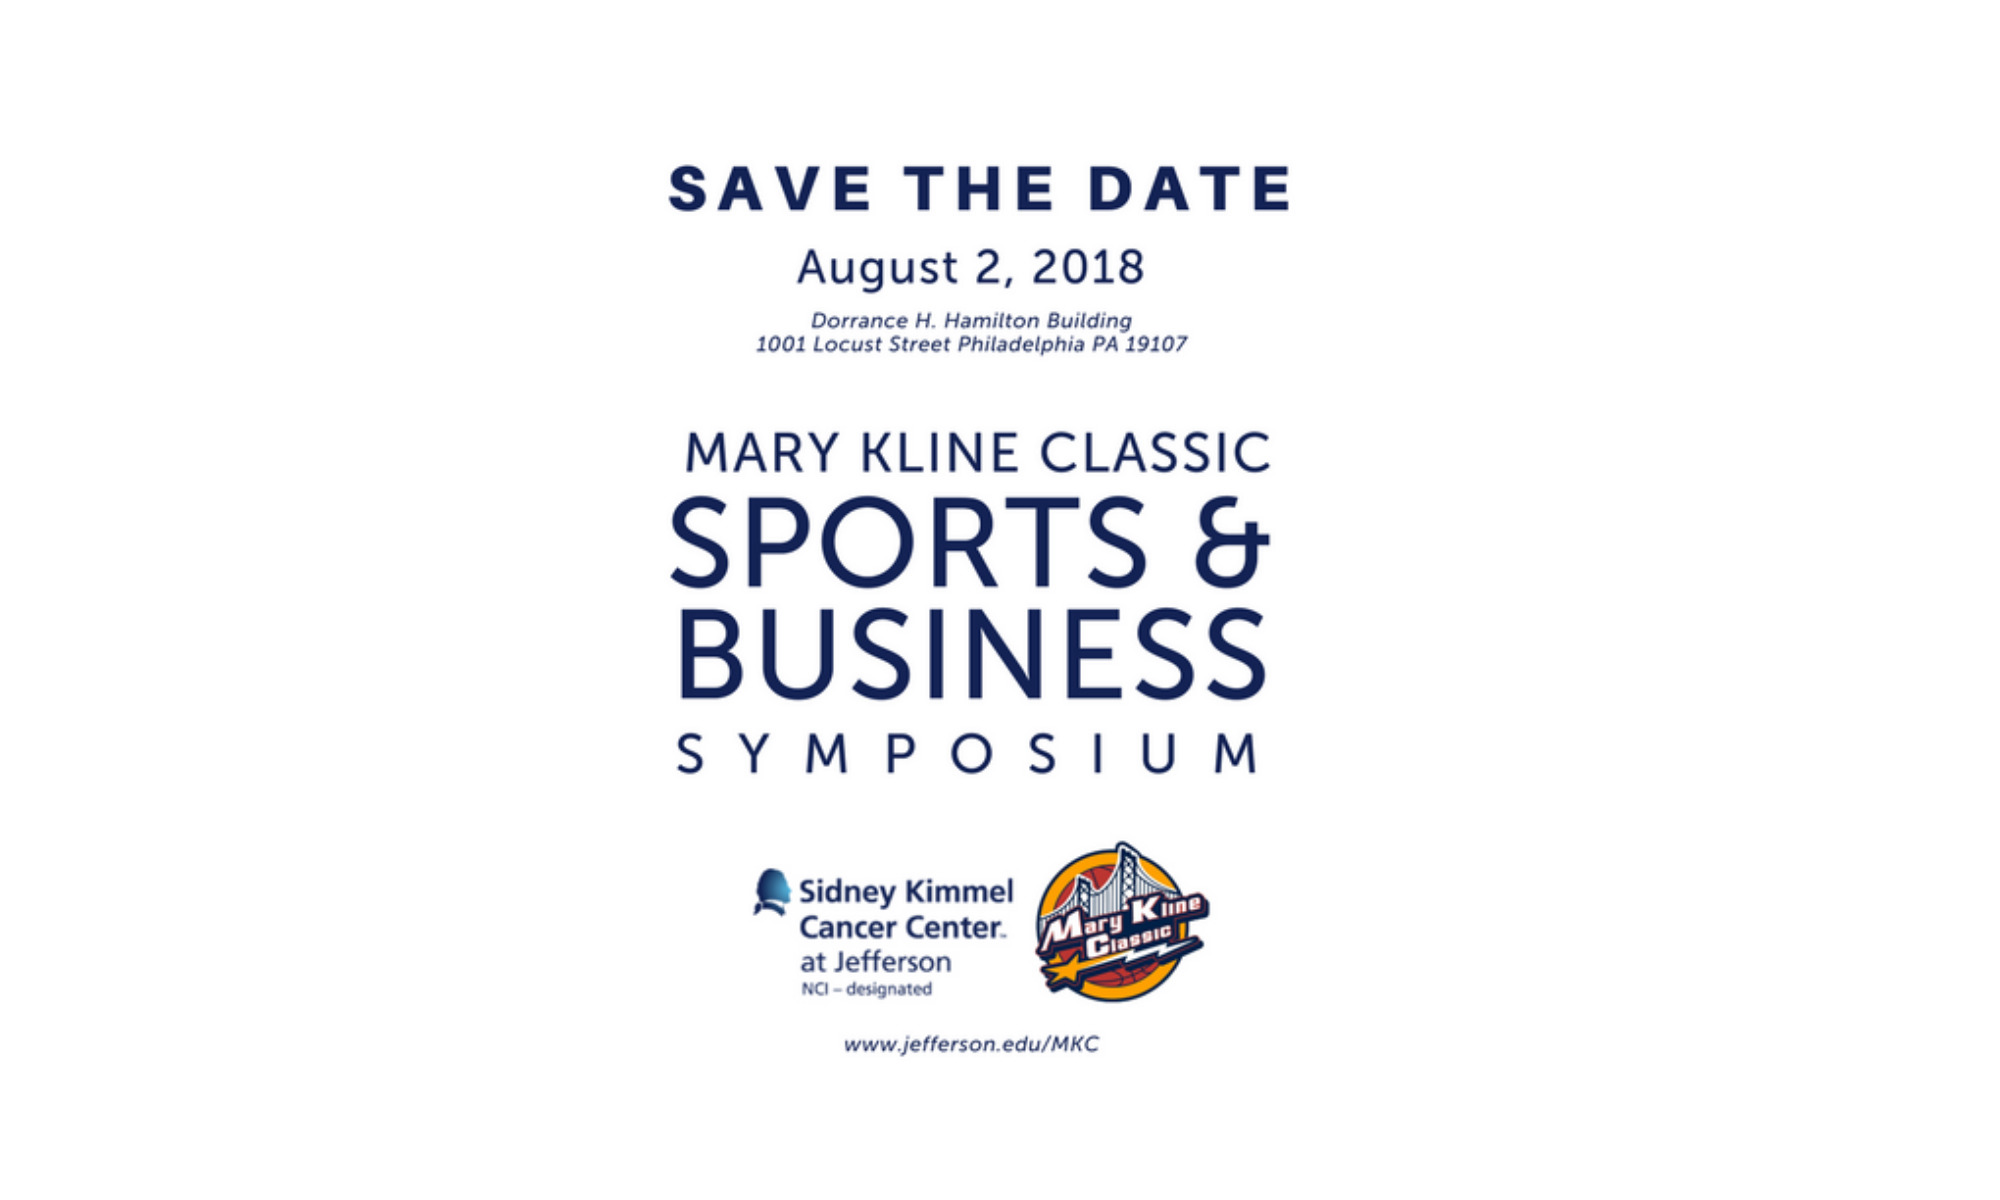 hoopdirt.com - Mary Kline Classic Sports & Business Symposium - August 2nd - Philadelphia, PA